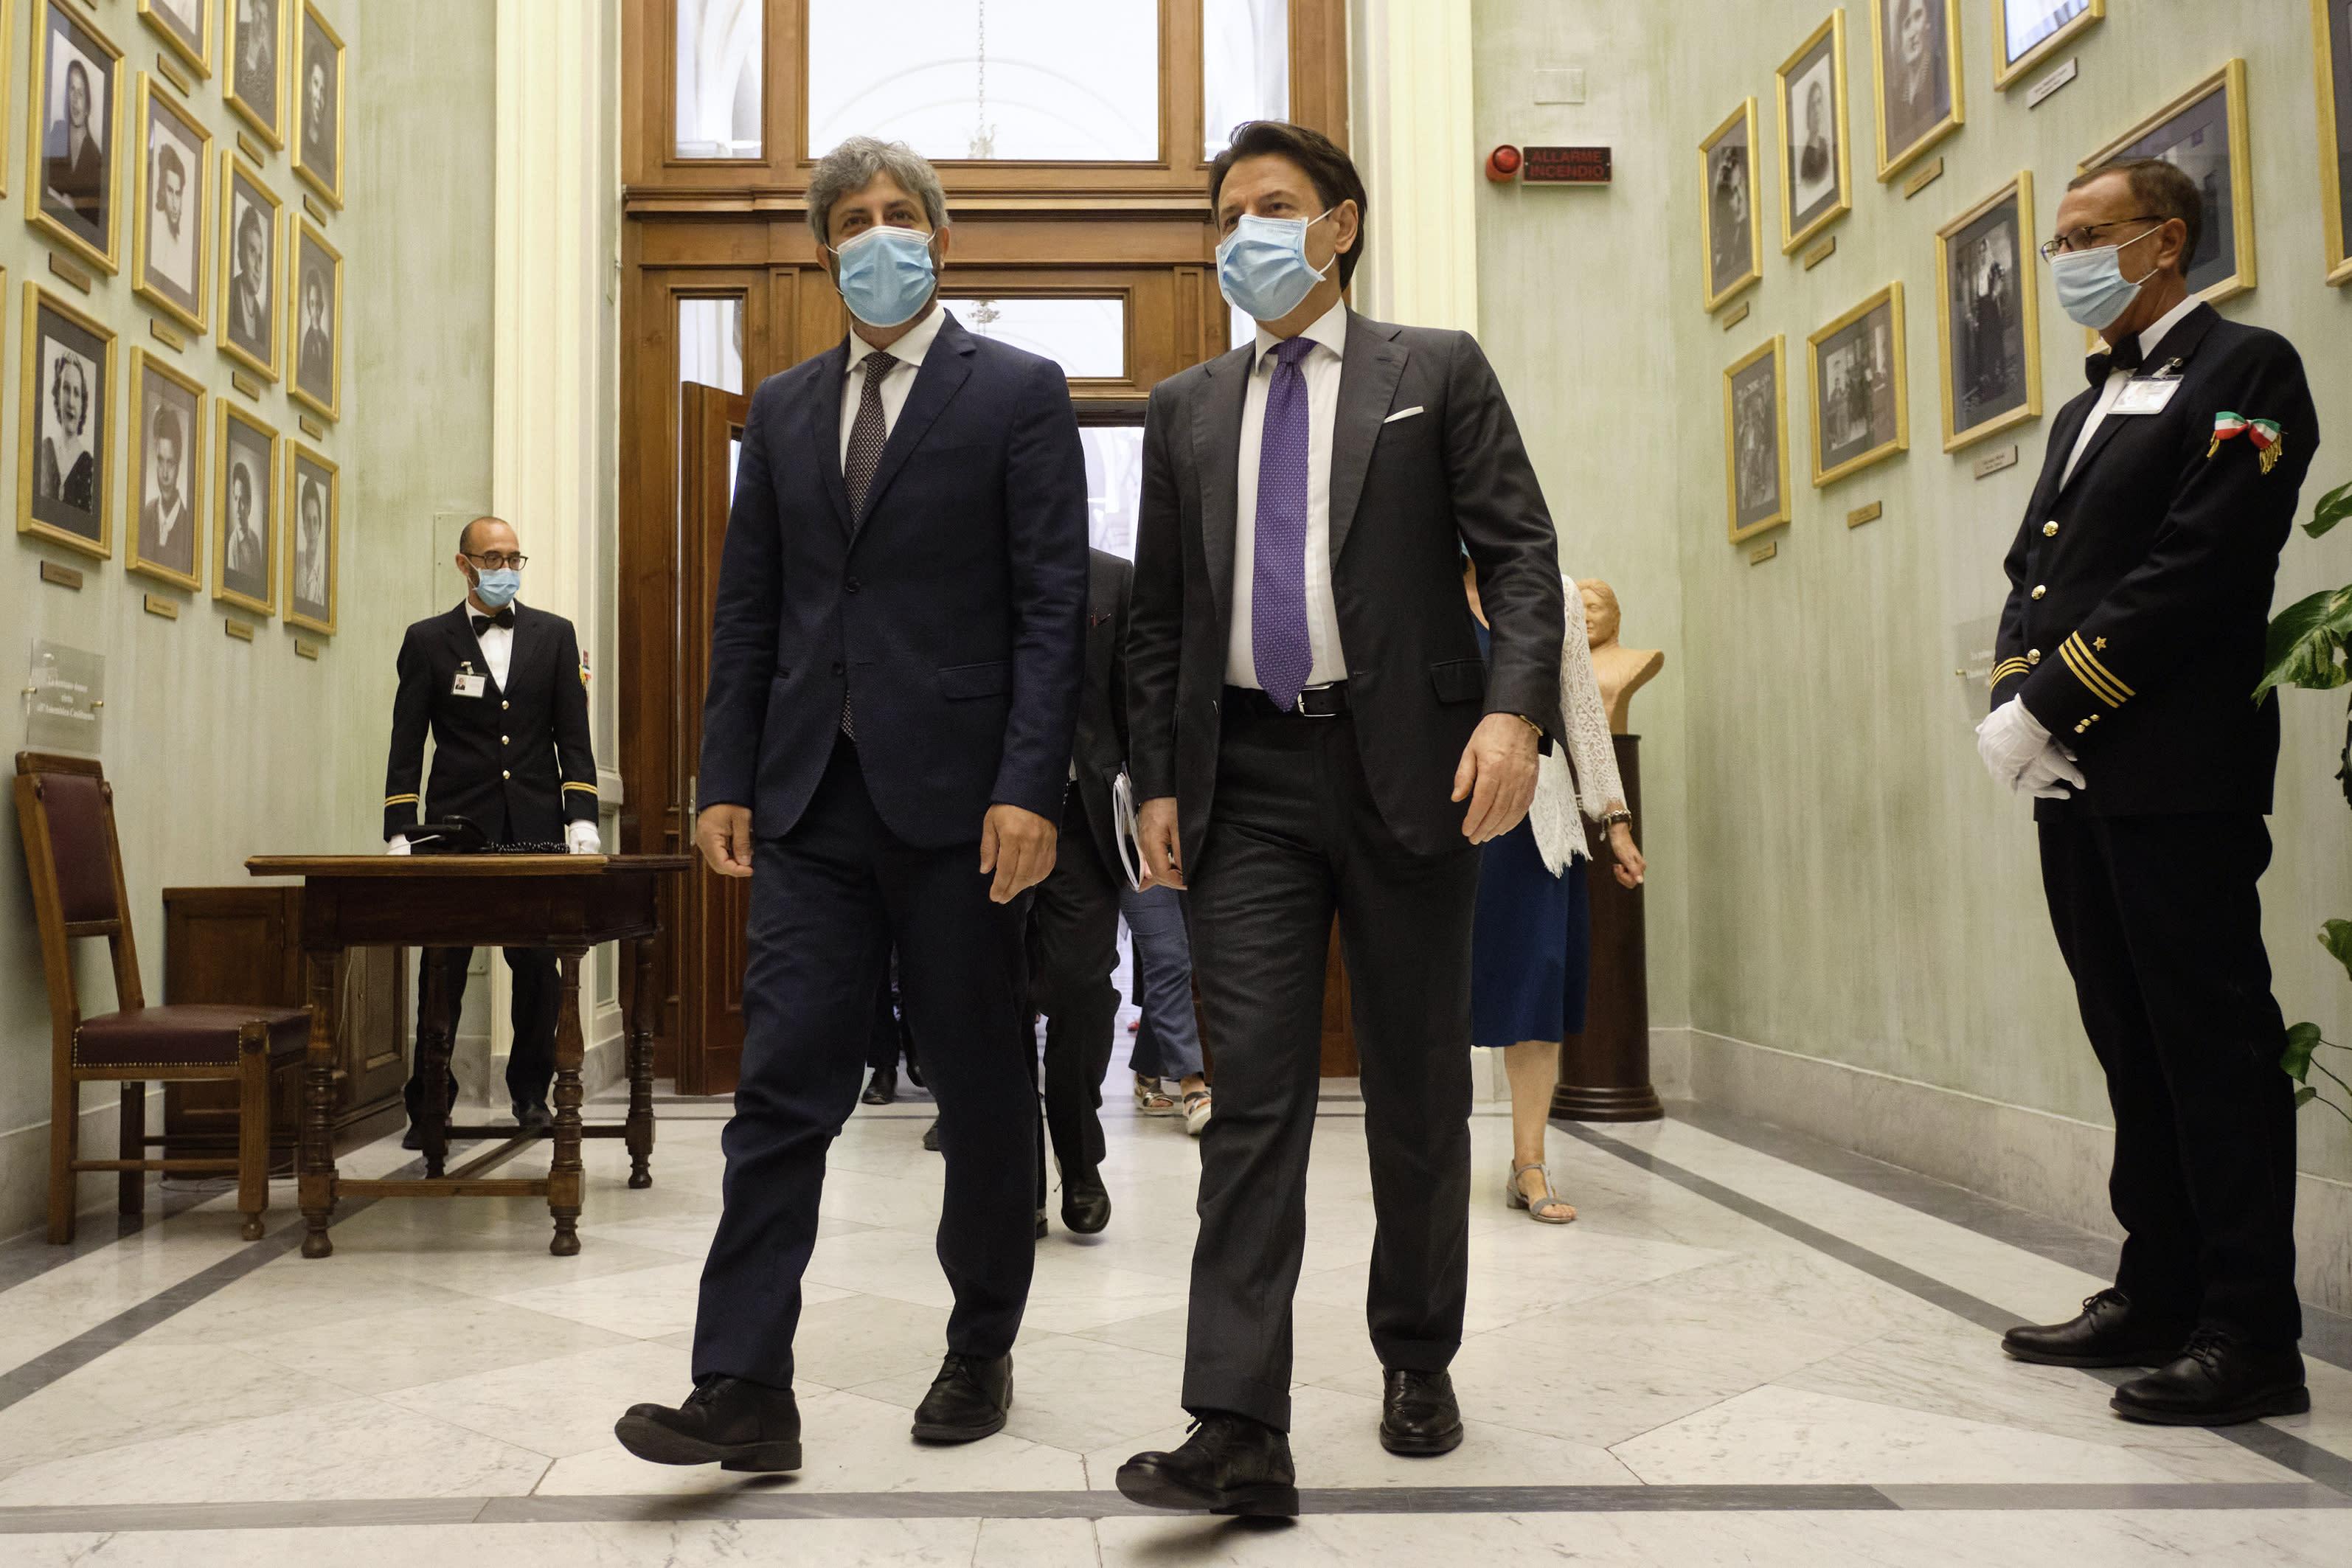 Italy Egypt Student Slain